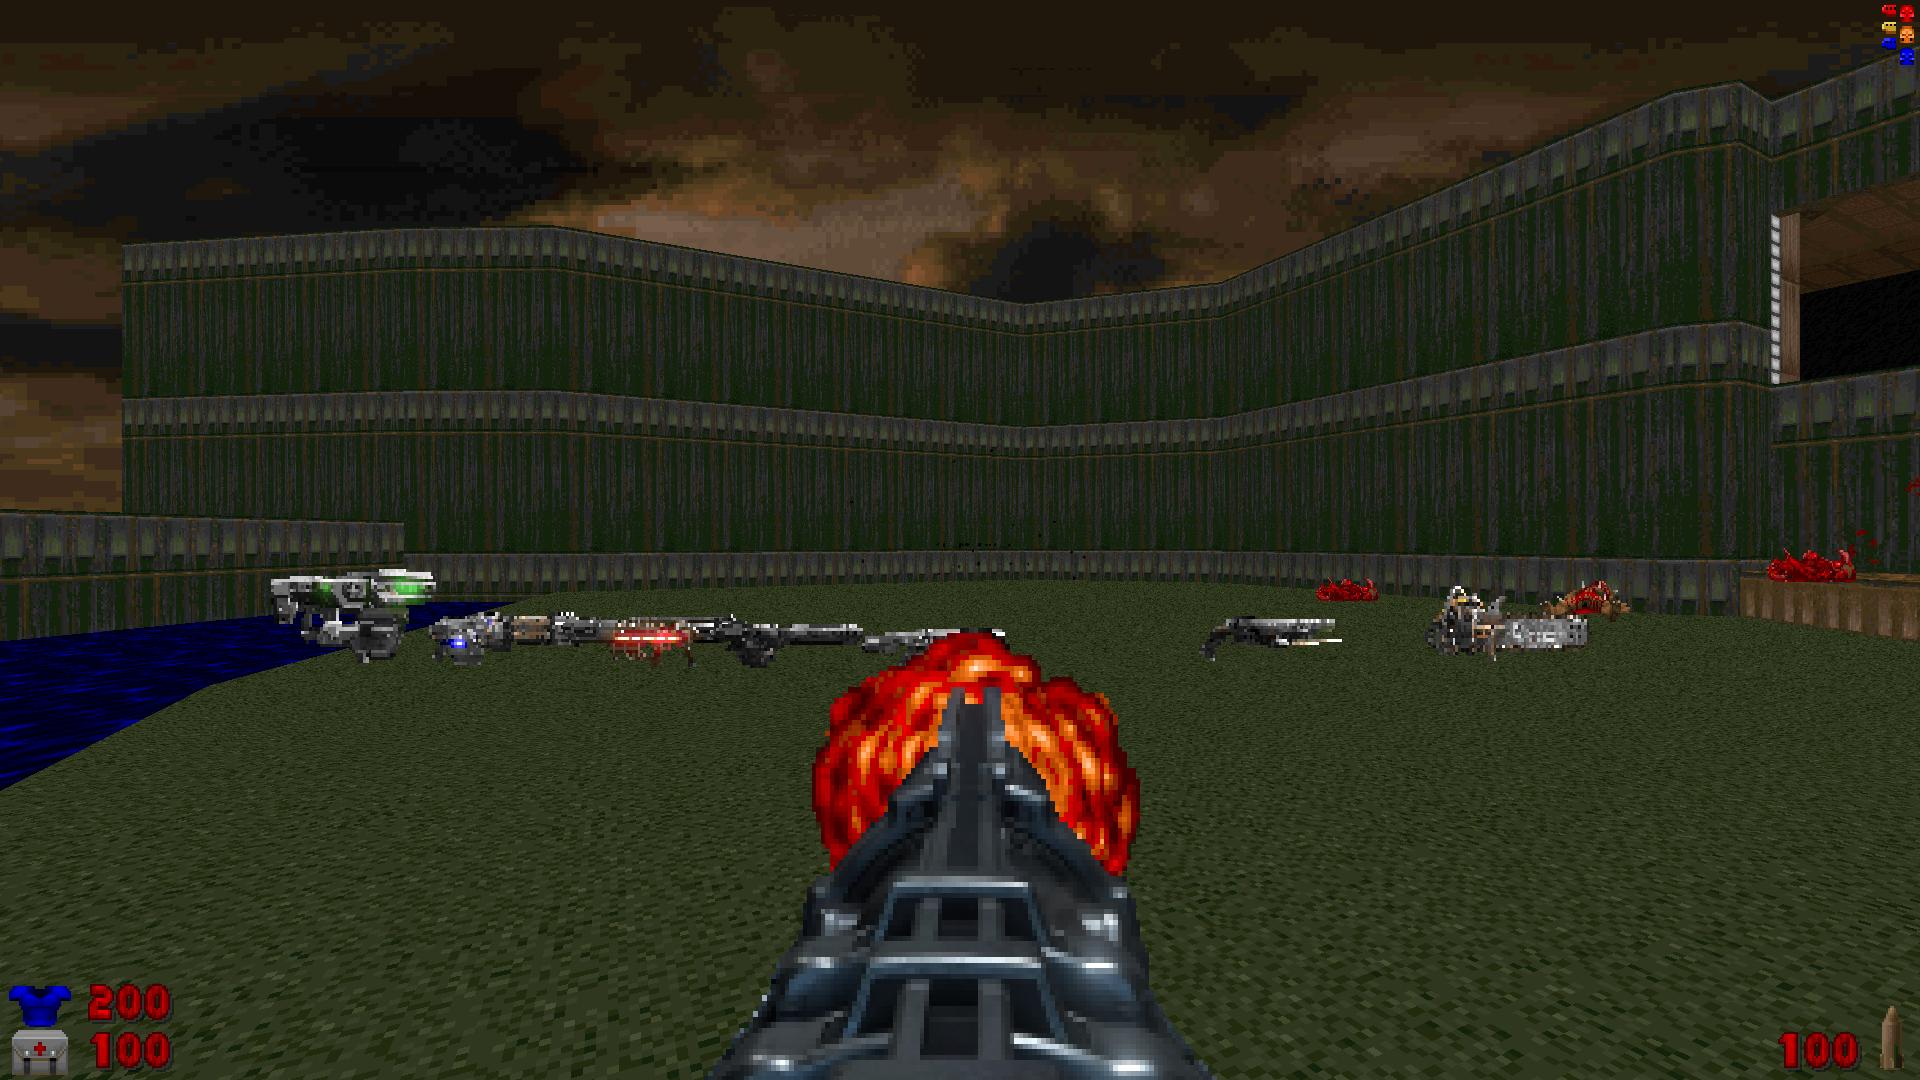 Screenshot_Doom_20200409_180539.png.6839b4ad87081454a2948aaba88e5d6b.png